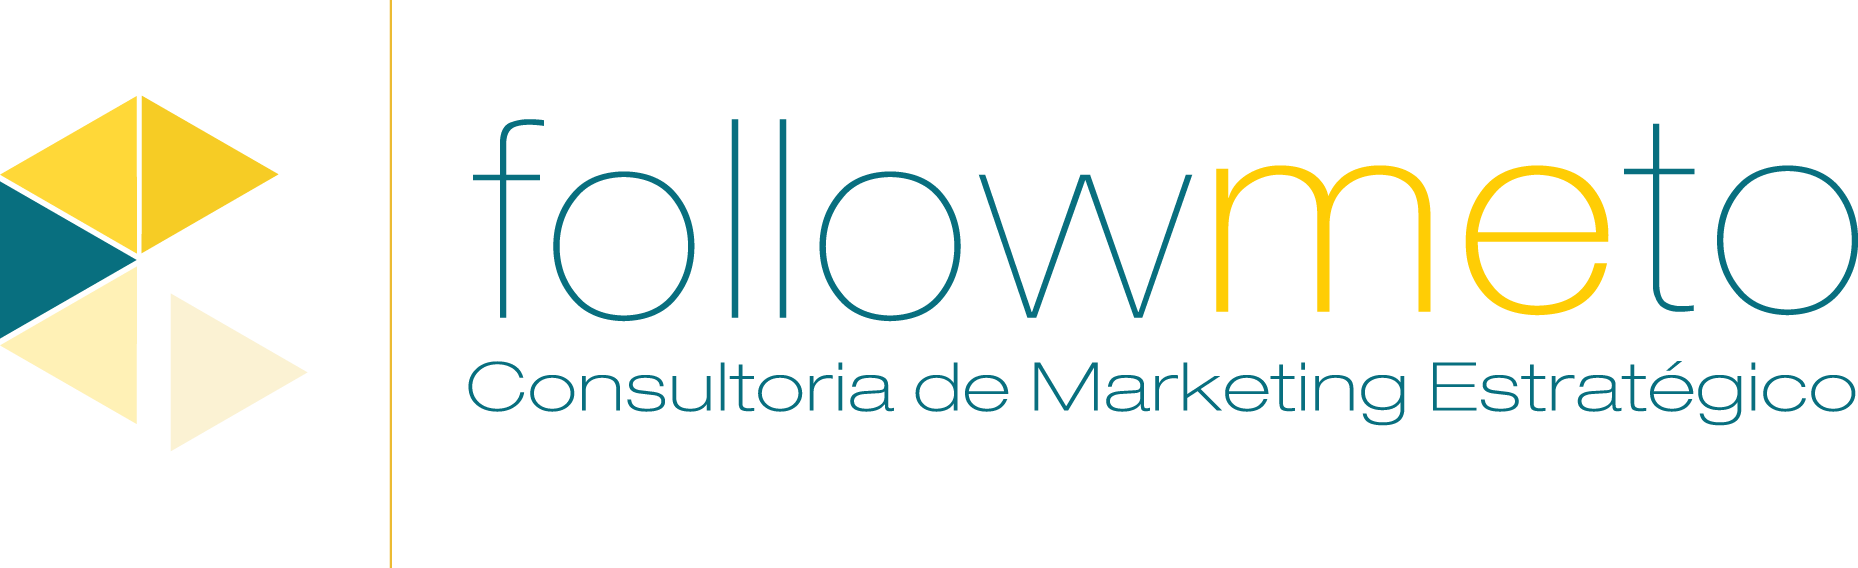 Followmedoctor